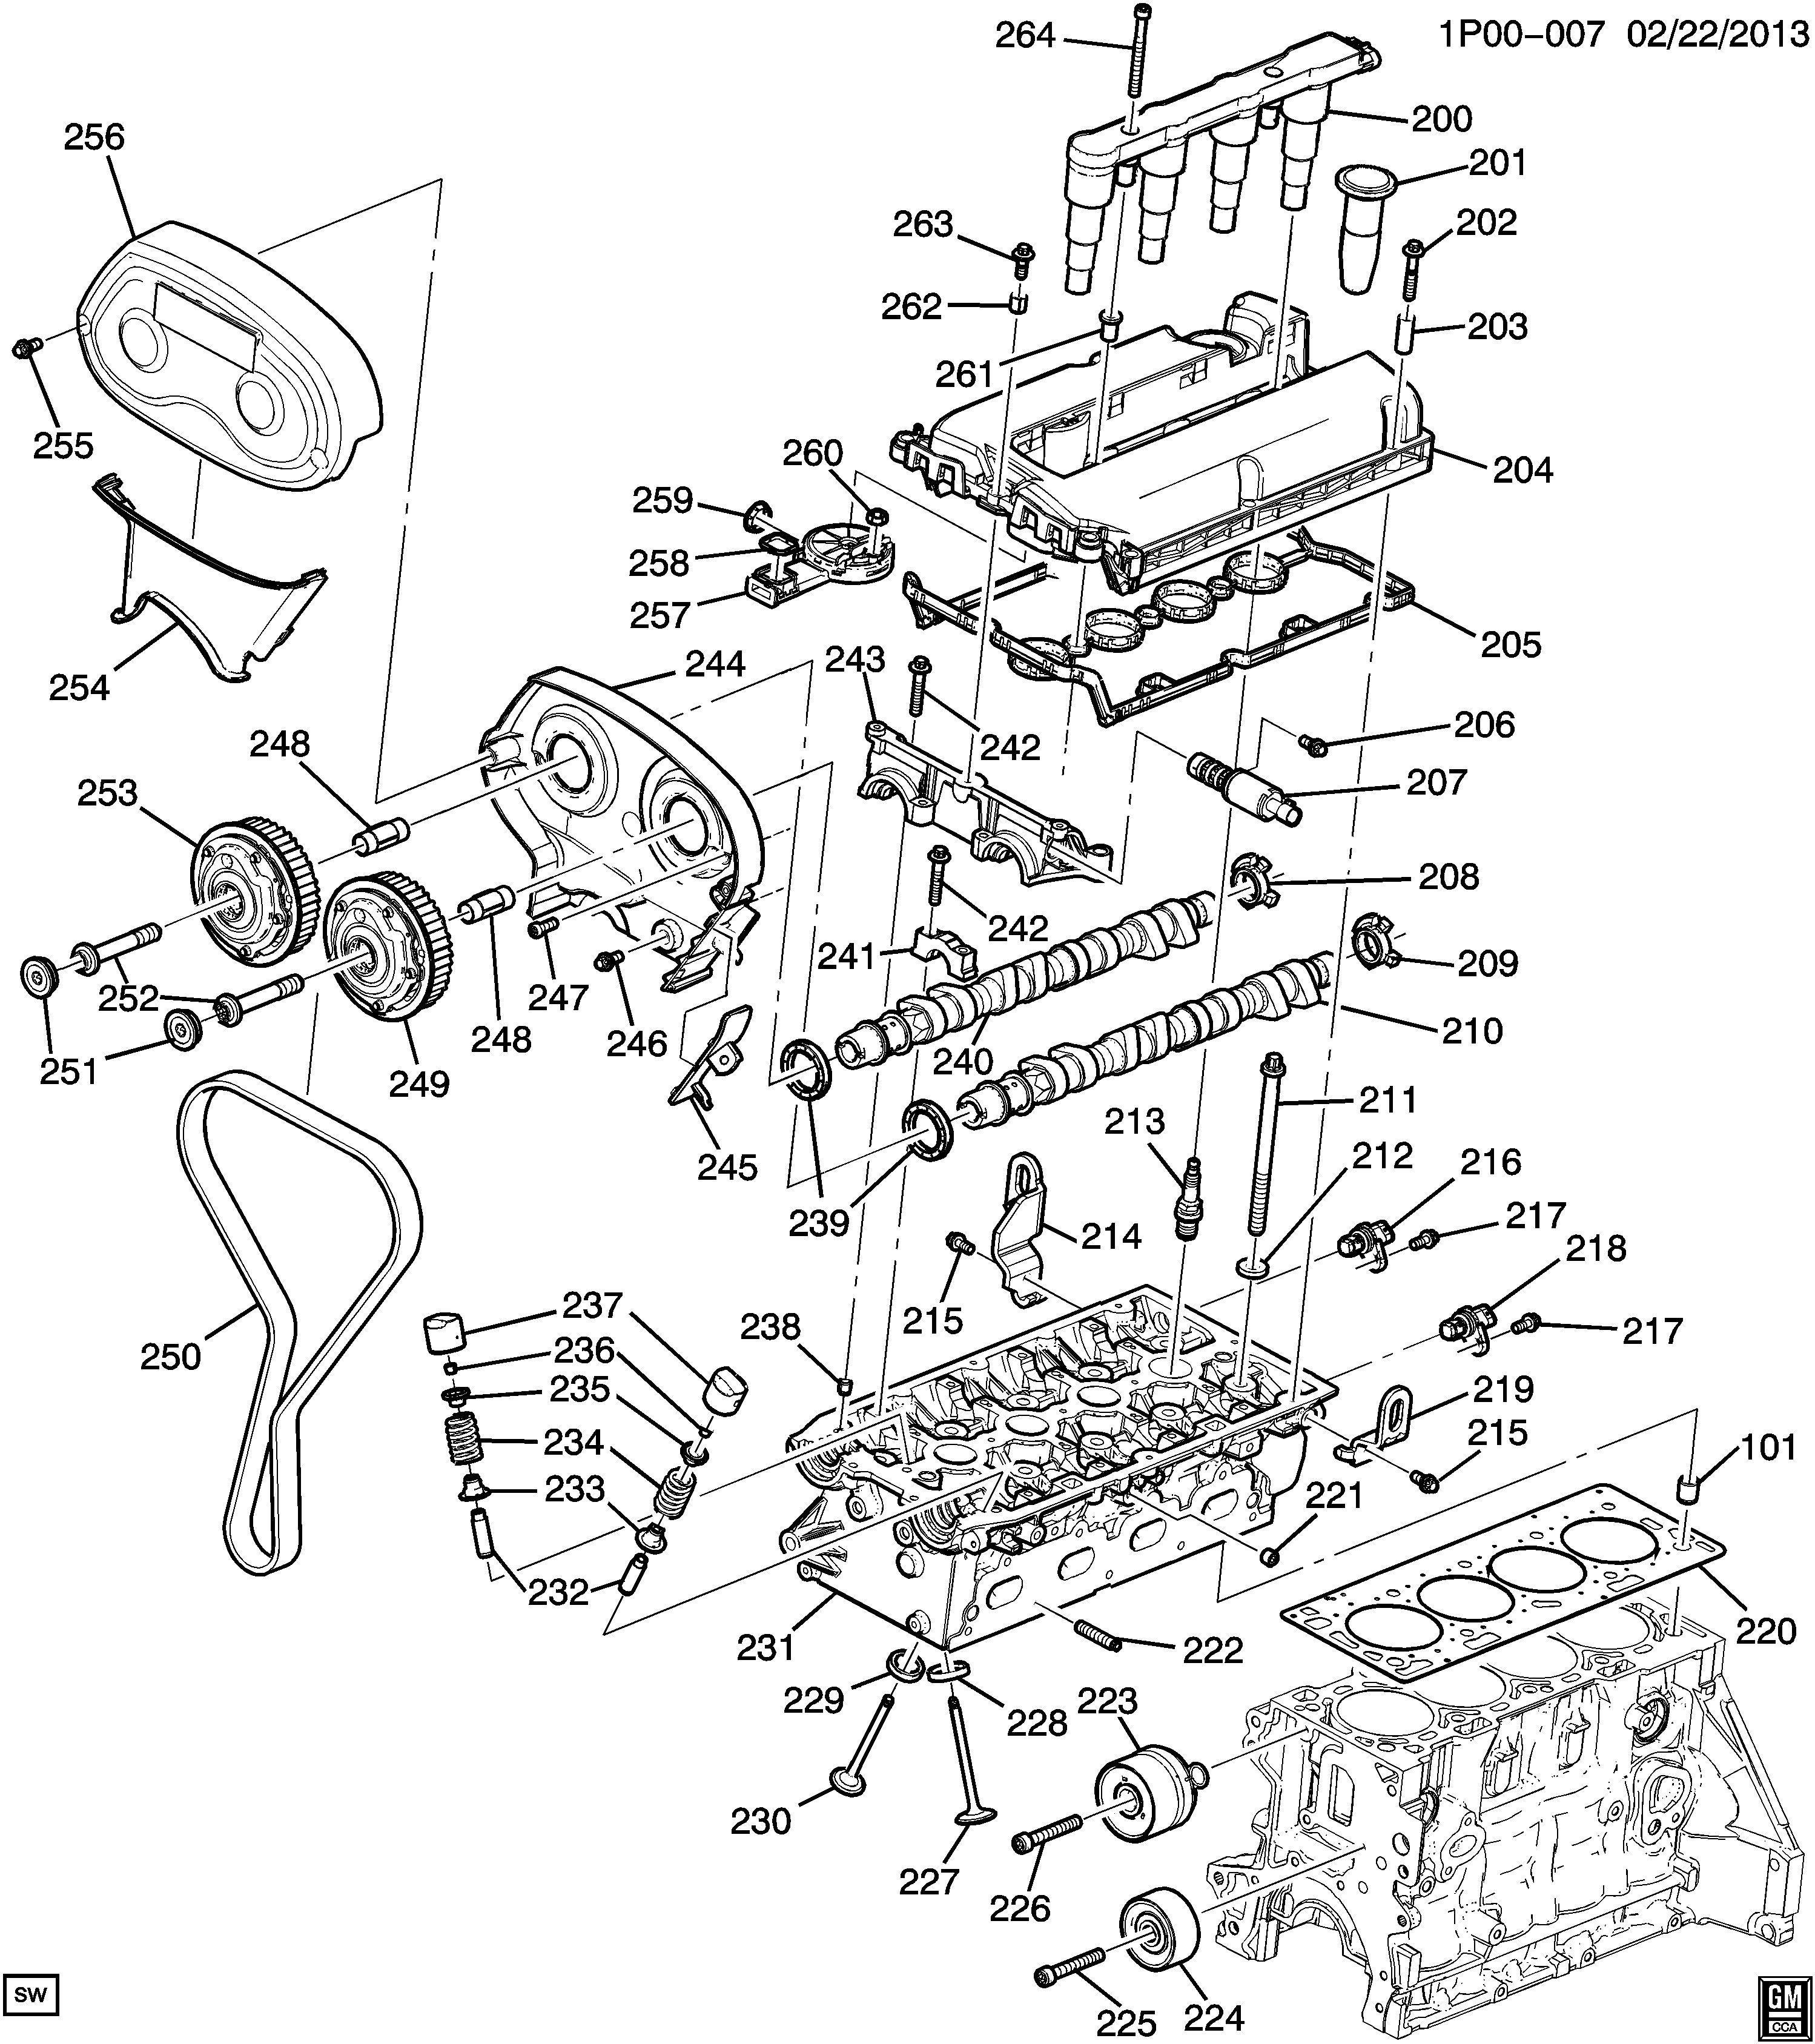 2.2l Ecotec Engine Diagram Diagram] 2012 Chevy Engine Diagram 1 8 Full Version Hd